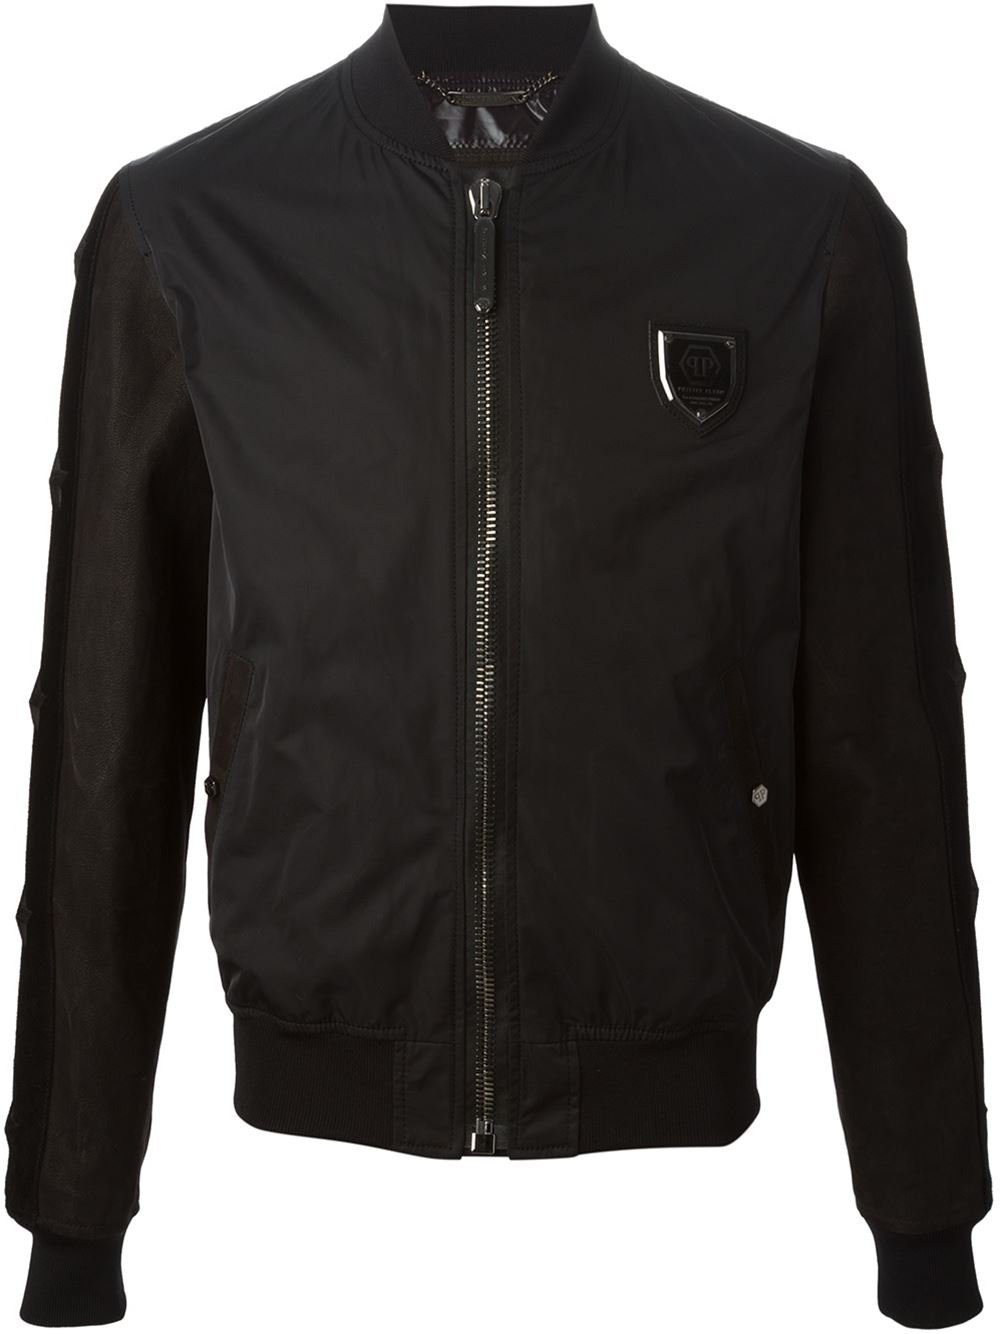 philipp plein black bomber jacket for men lyst. Black Bedroom Furniture Sets. Home Design Ideas